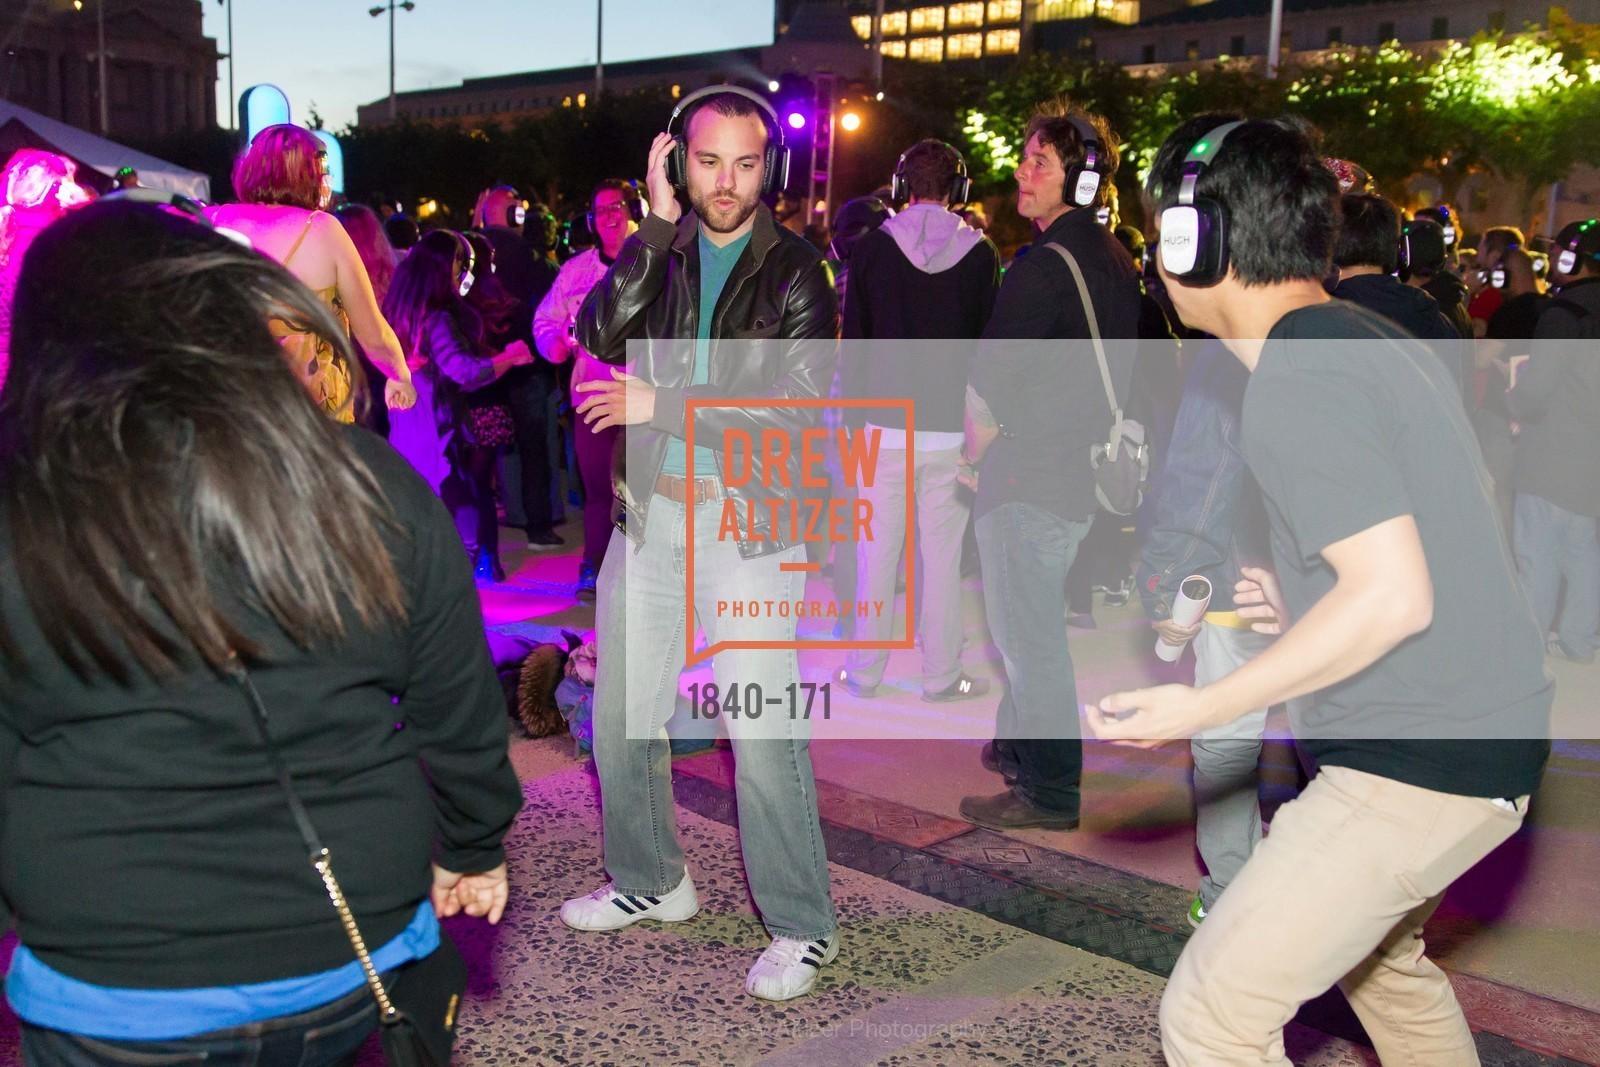 Atmosphere, San Francisco City Hall Centennial Celebration, Civic Center Plaza, June 18th, 2015,Drew Altizer, Drew Altizer Photography, full-service agency, private events, San Francisco photographer, photographer california